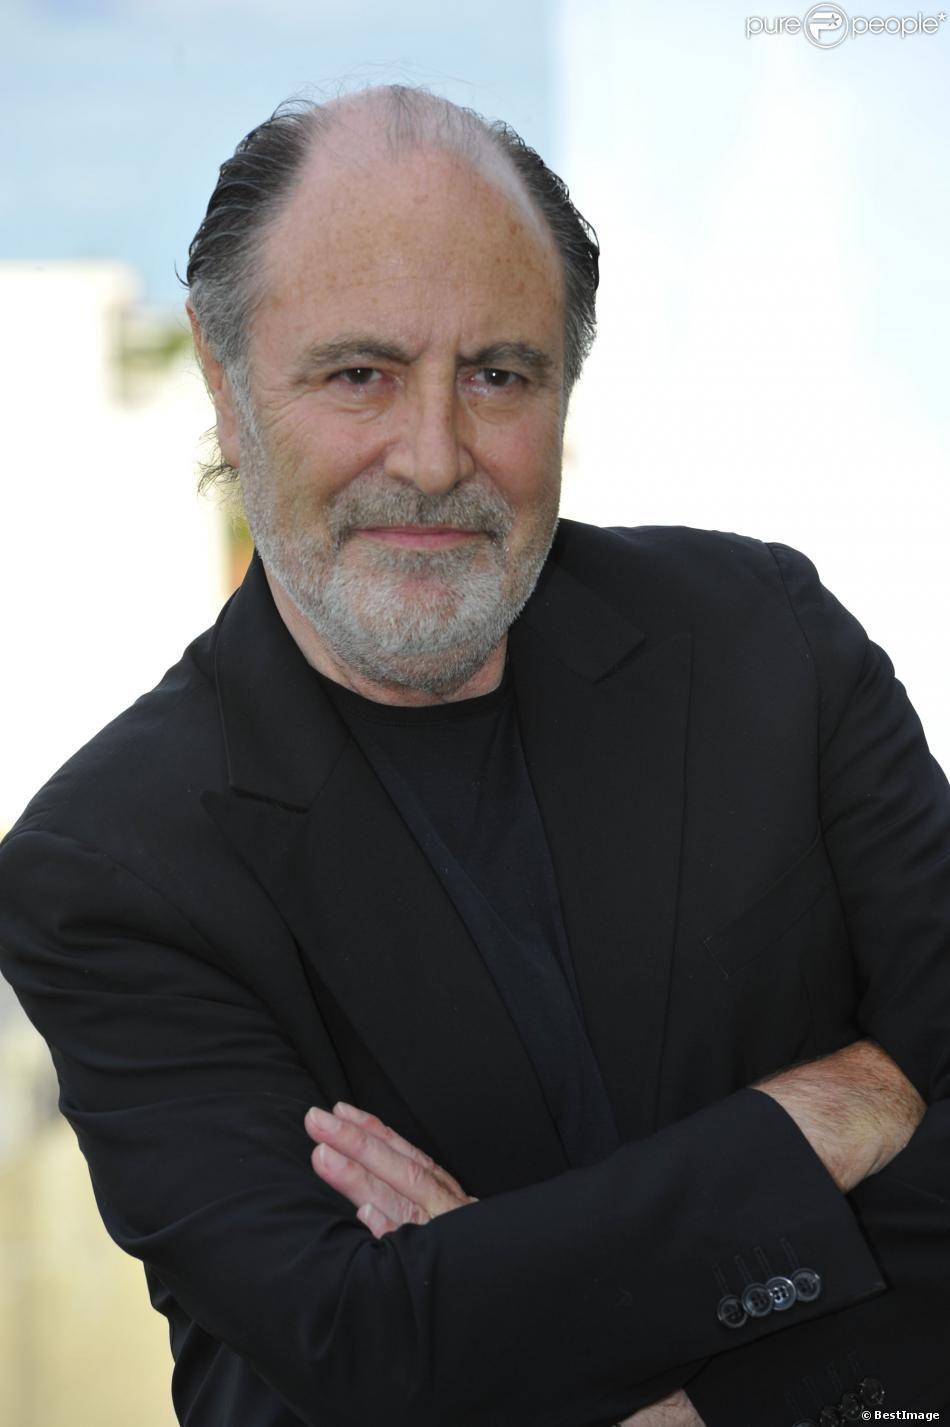 Michel Delpech 26.1.1946 - 2.1.2016, french singer